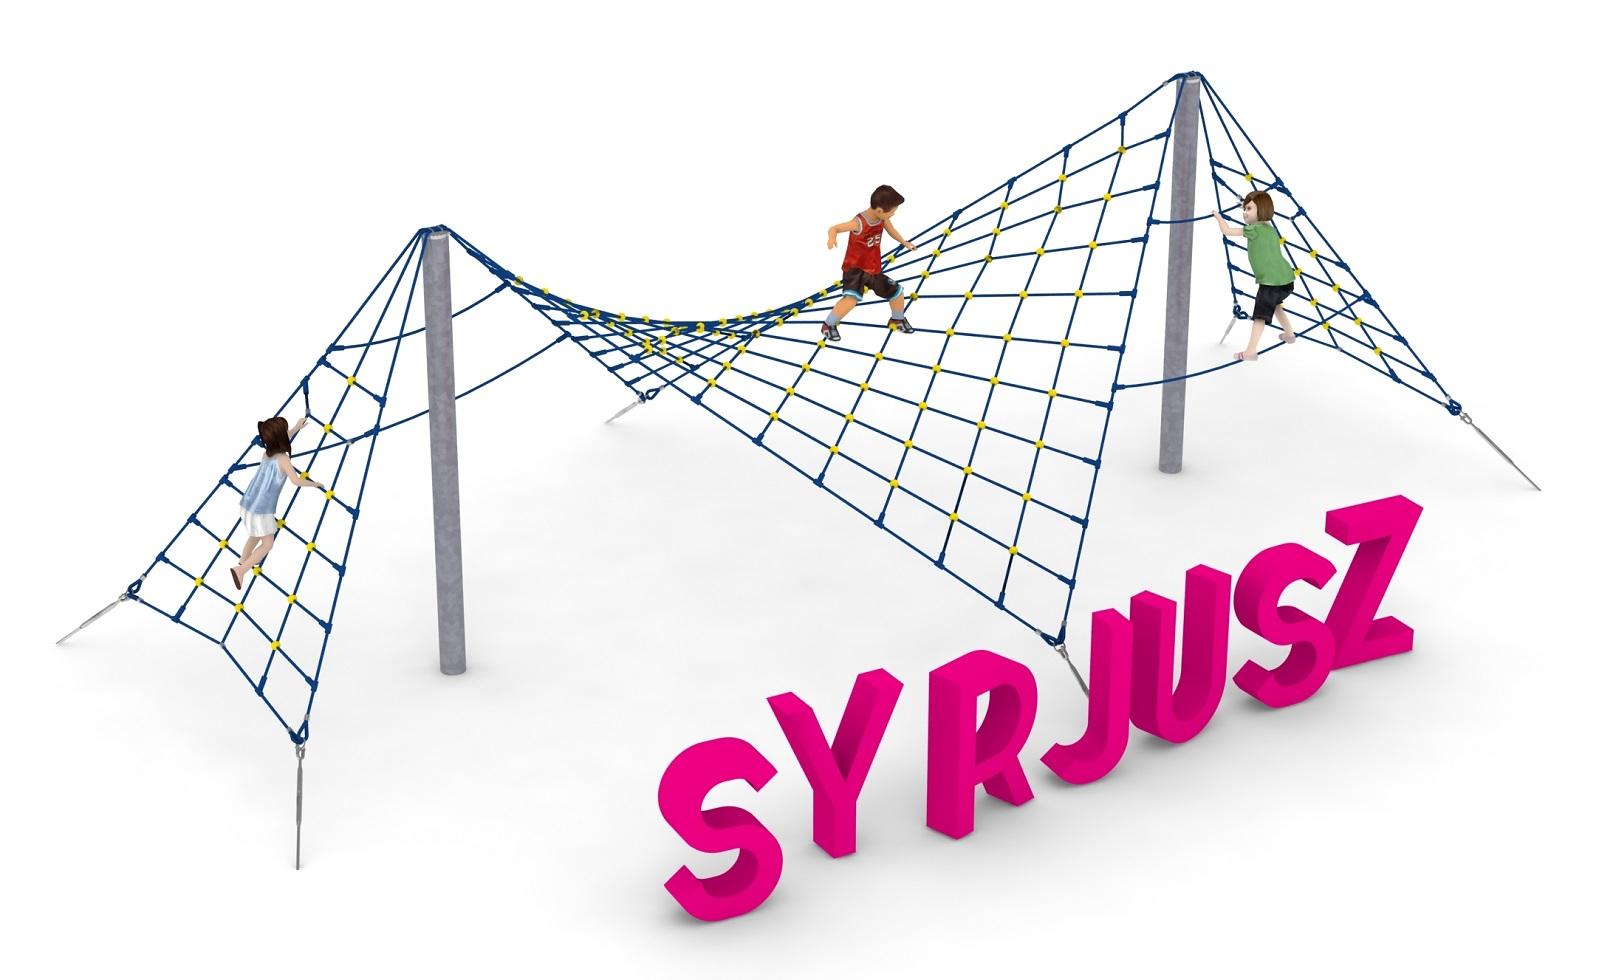 Syrjusz